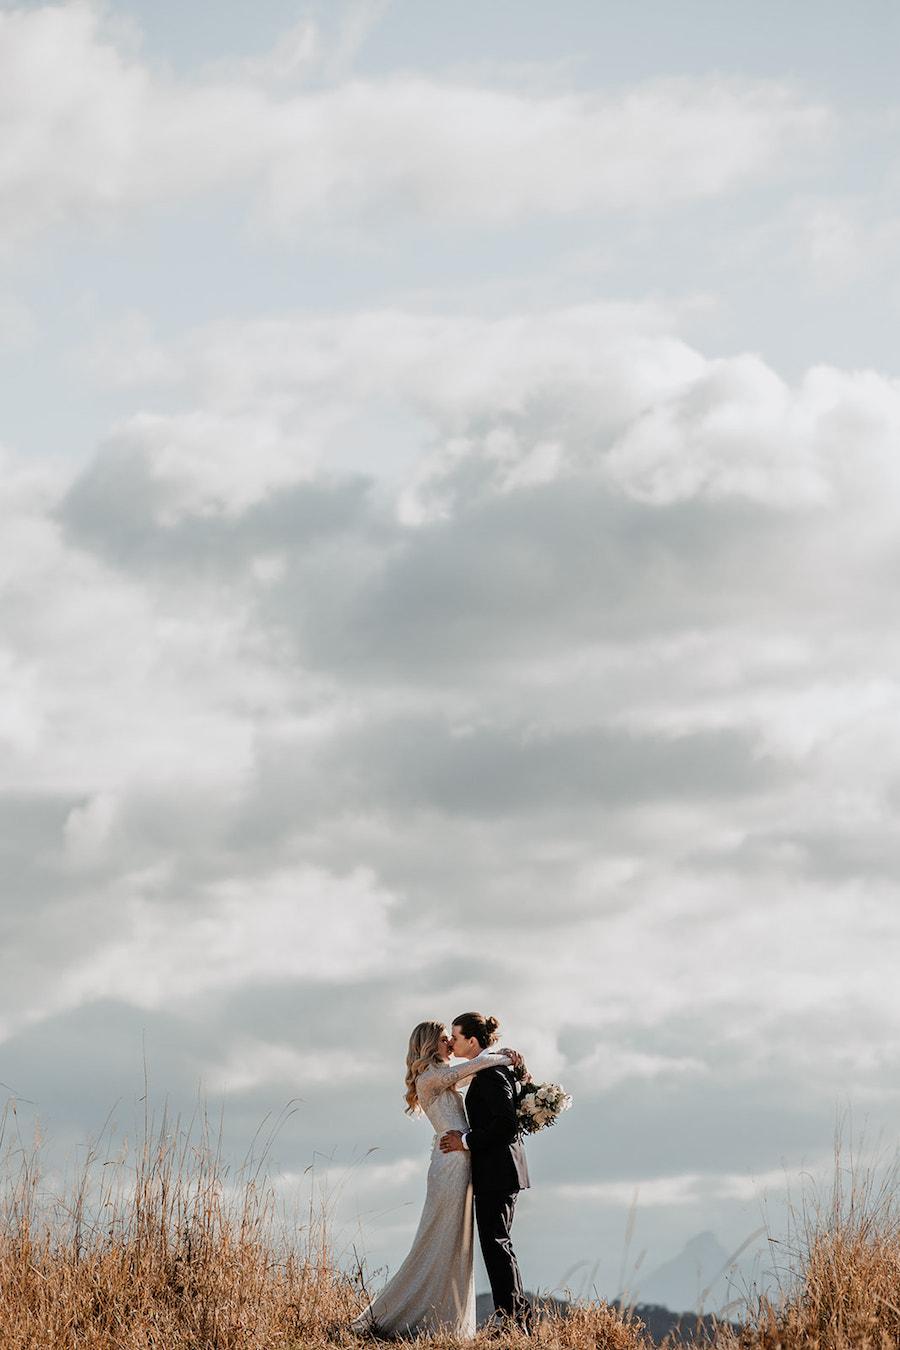 tweed-coast-weddings-wedding-venue-osteria-kelly-rohan-cloud-catcher-photography-Web_RK431.jpg